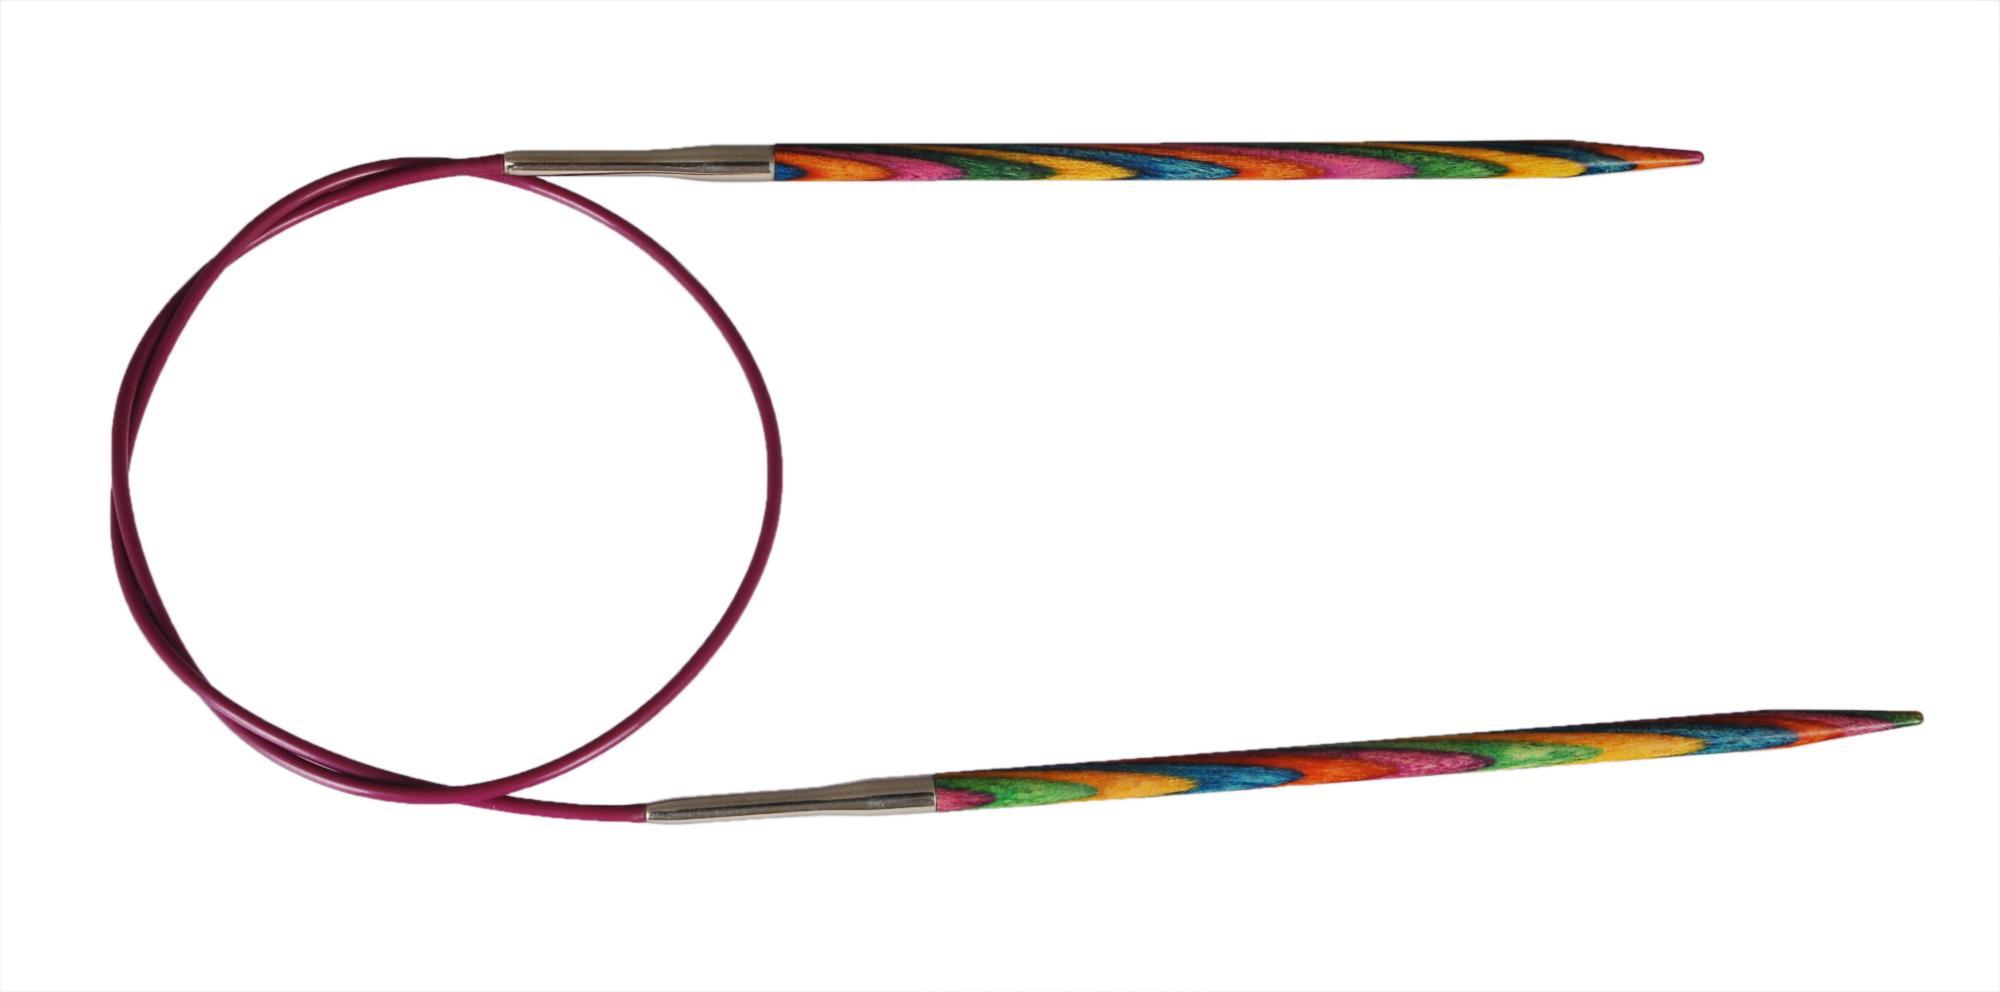 Спицы круговые 150 см Symfonie Wood KnitPro, 21384, 5.00 мм